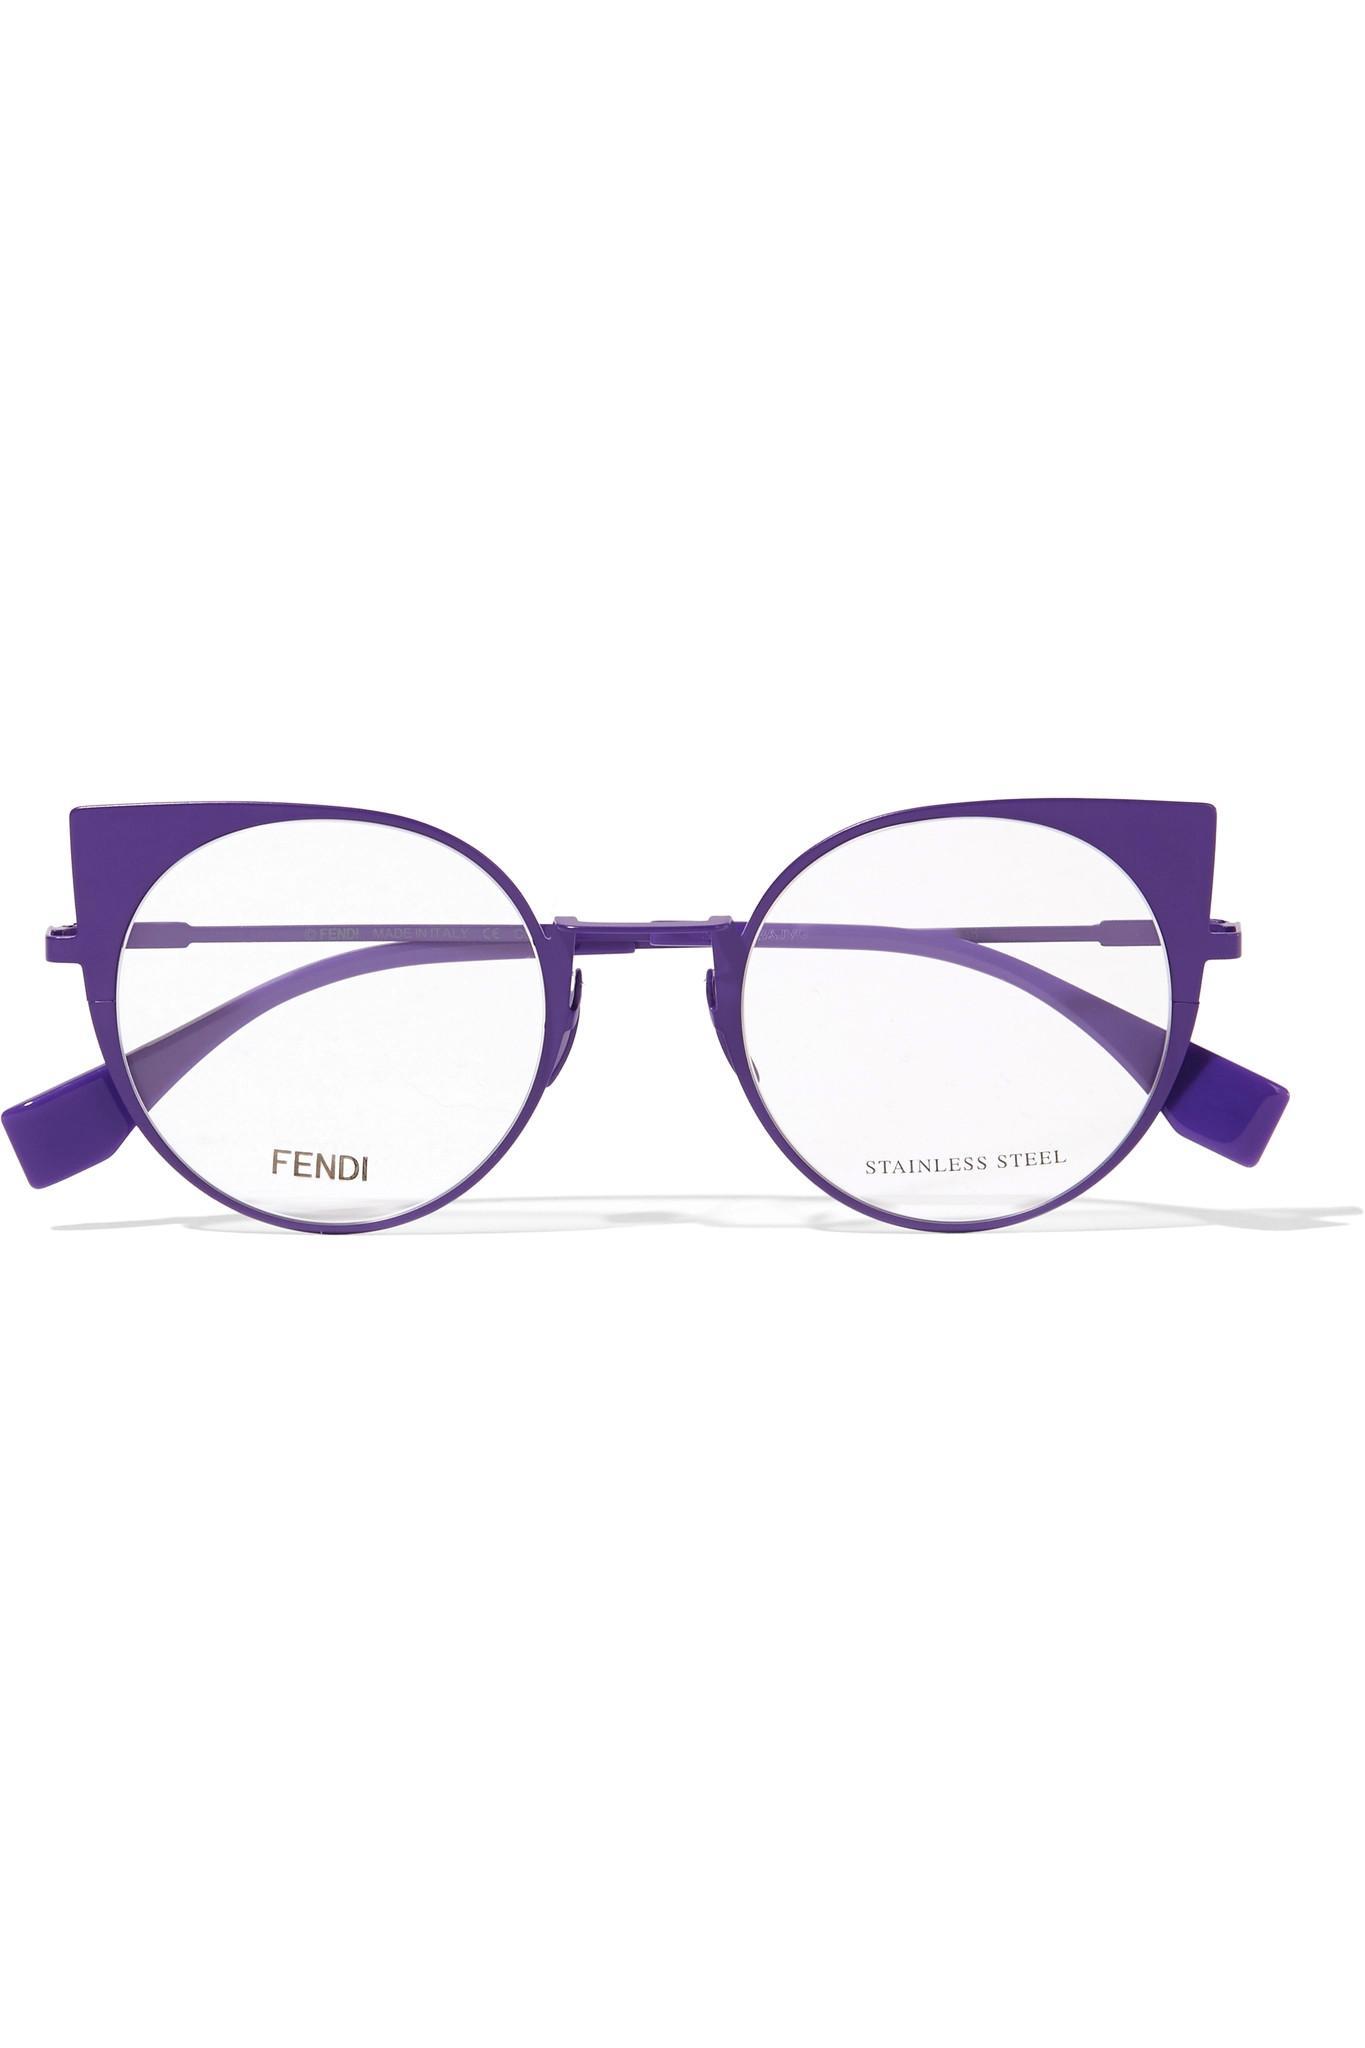 610ab3291338f Fendi Cat-eye Metal Optical Glasses in Purple